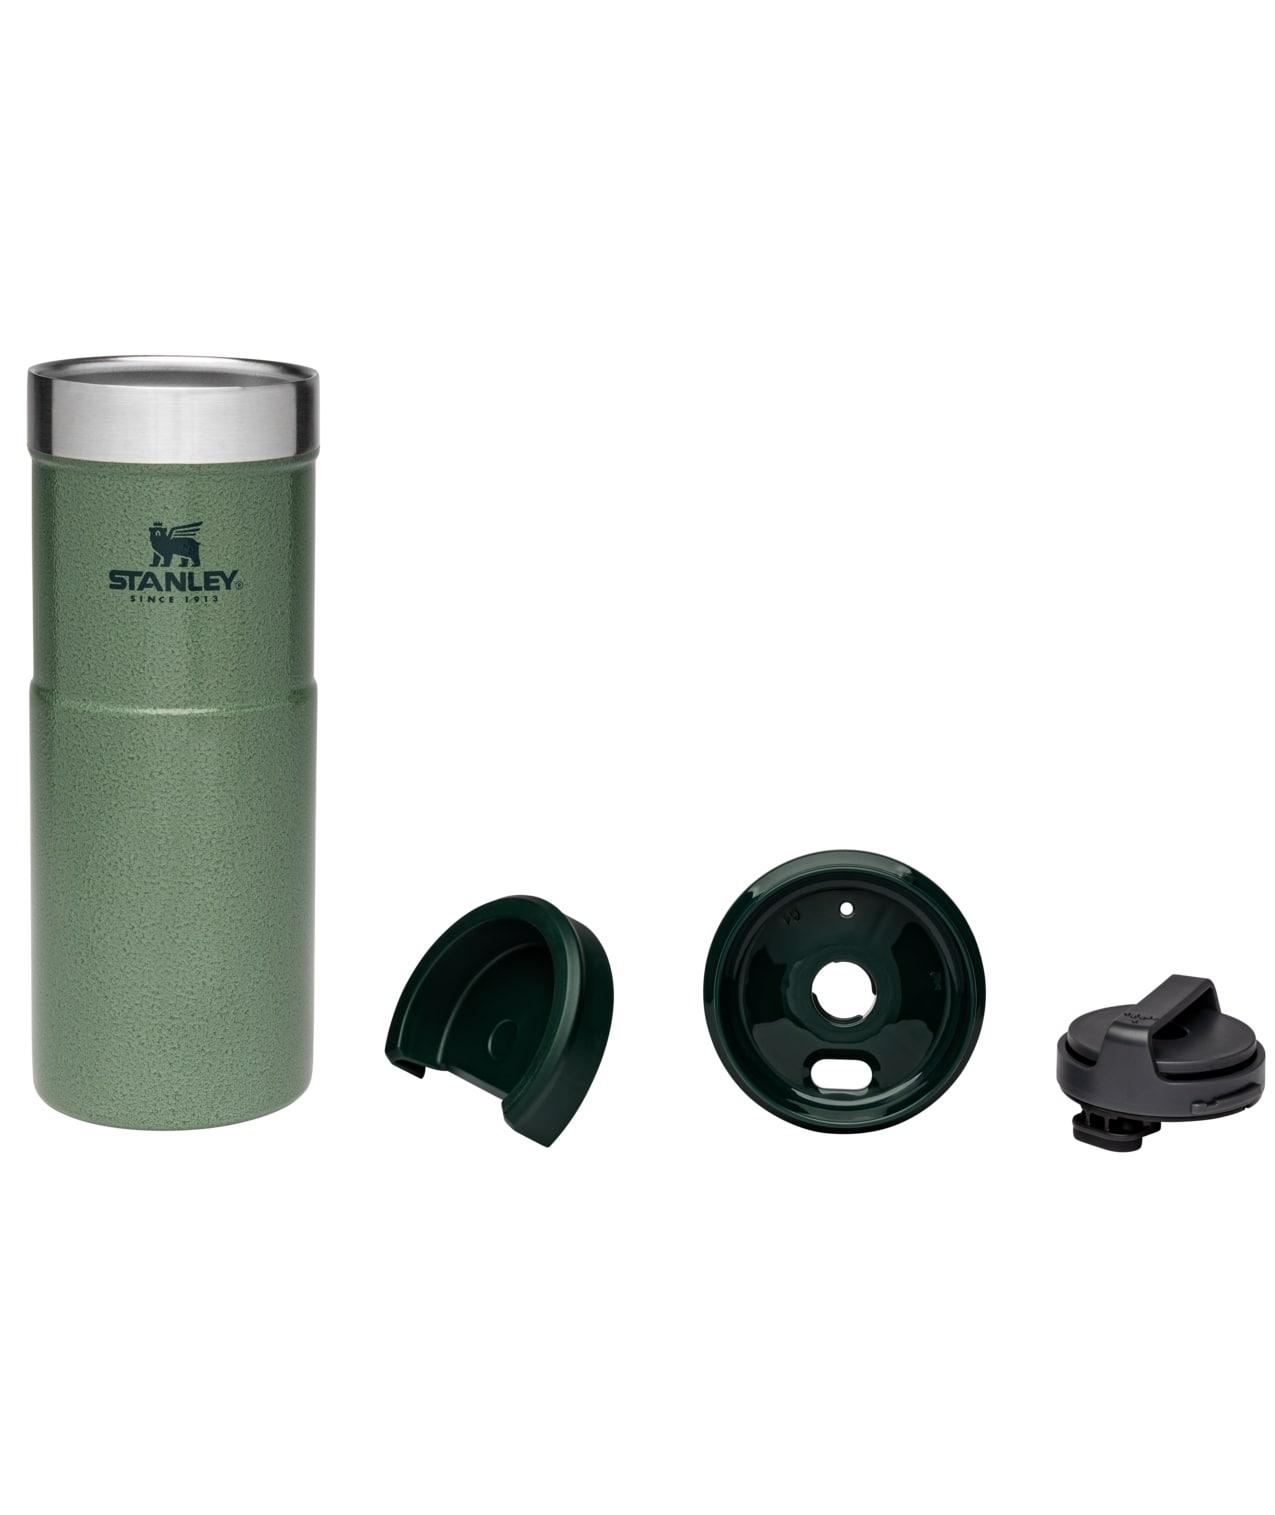 Stanley Classic The NeverLeak Travel Mug 16oz – 0.47L – HM Green